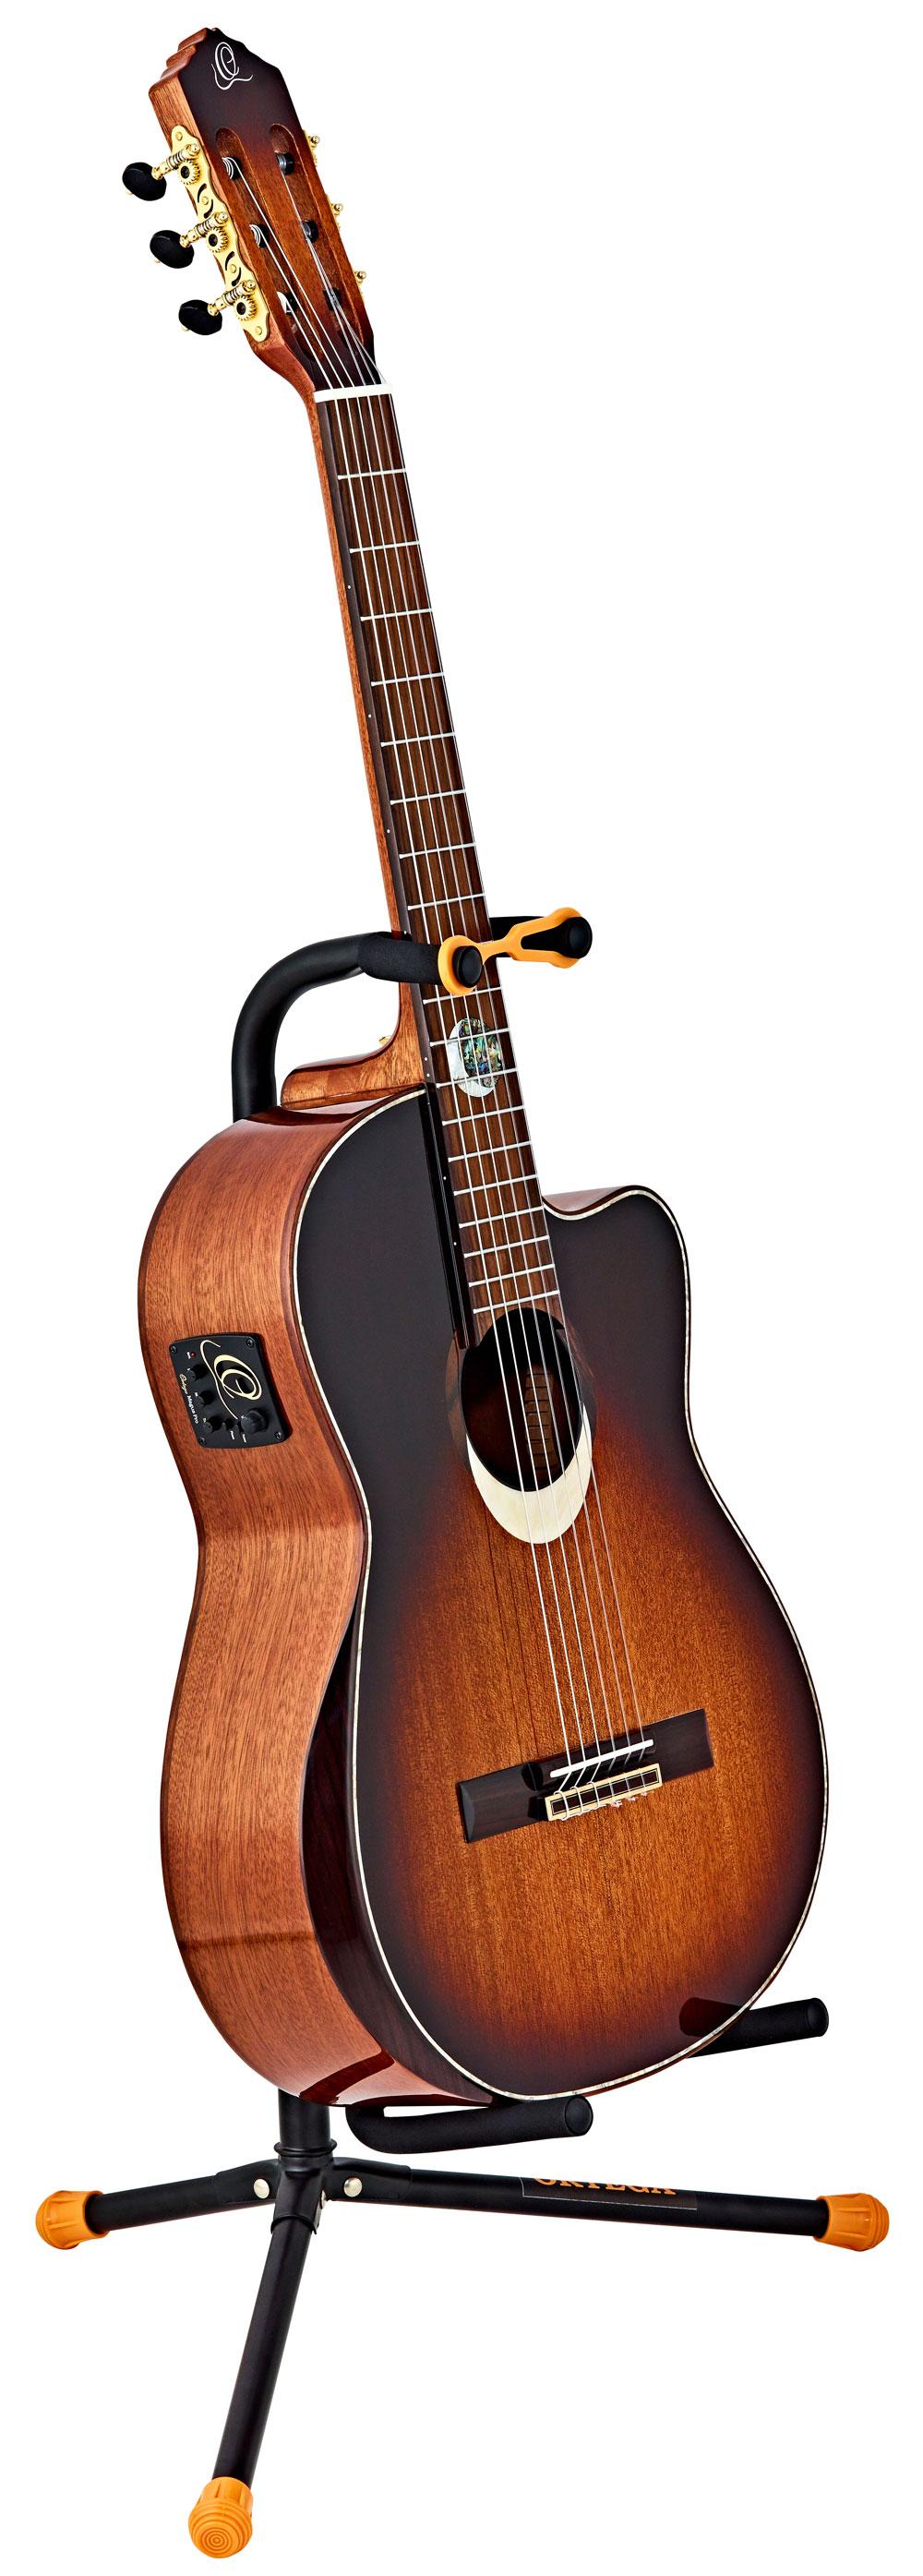 Universal Stahl Akustik Gitarrenständer E-Gitarre Bass Stativ Halter Faltbar